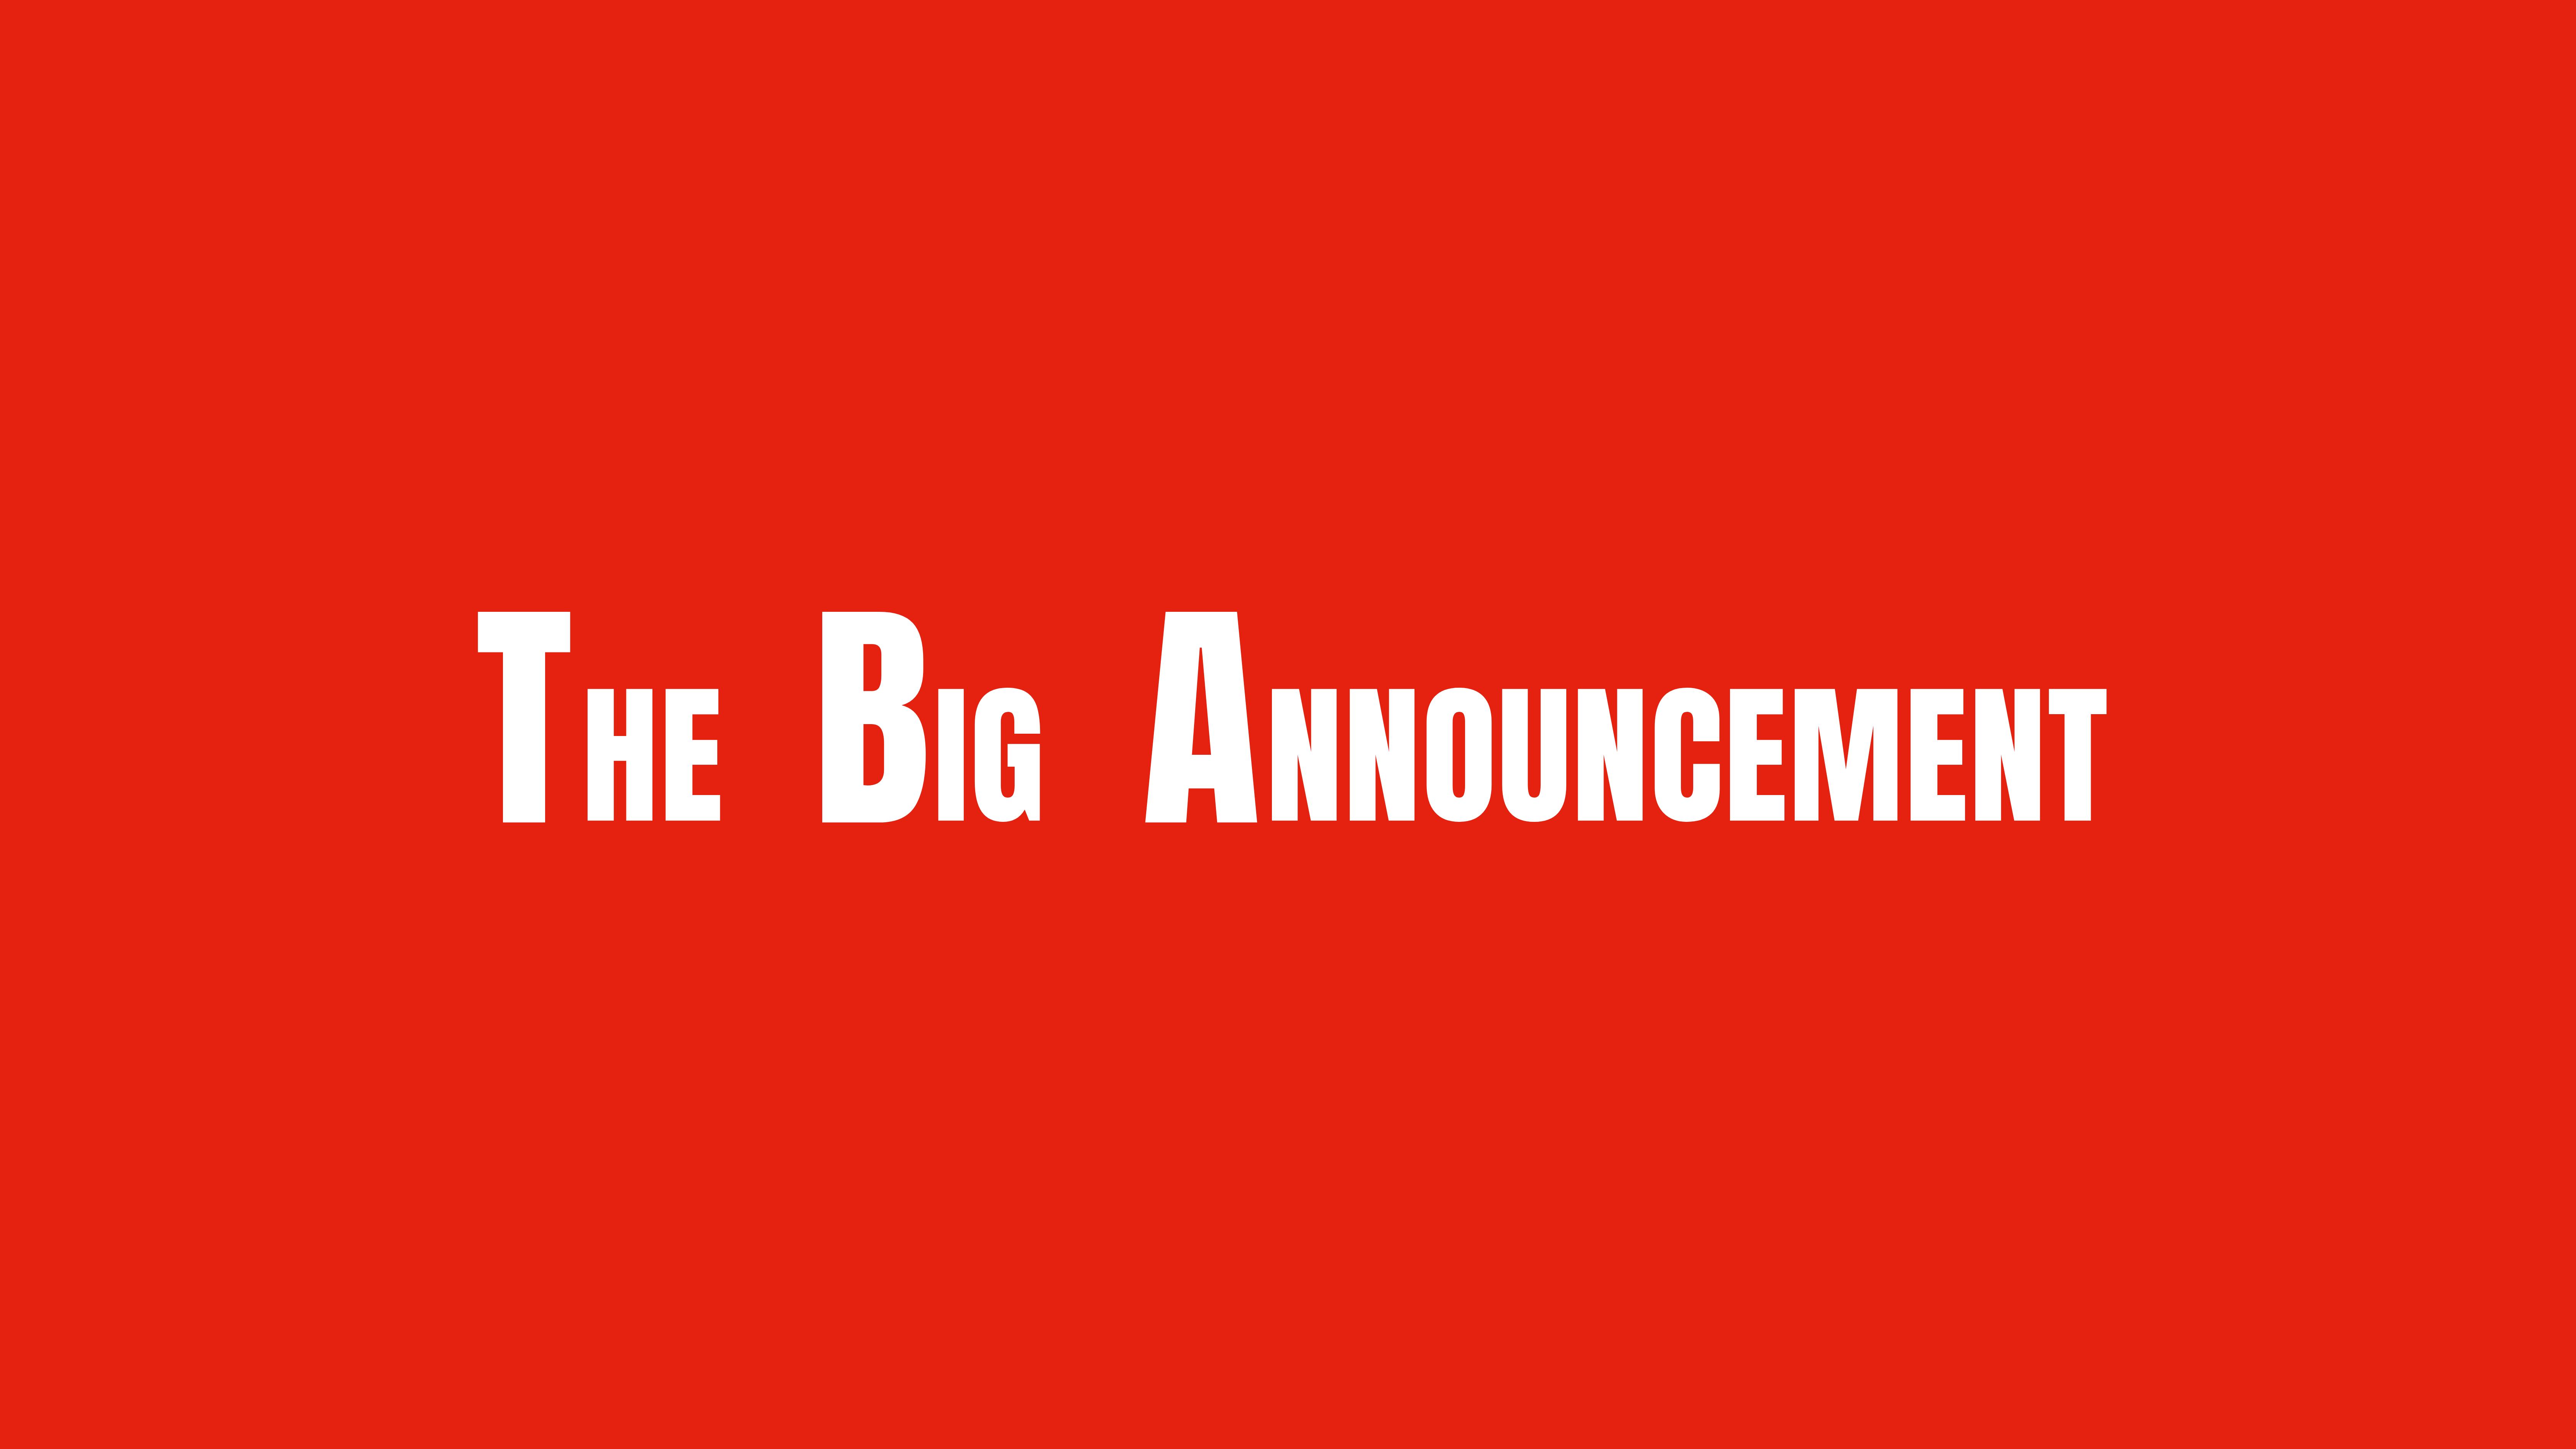 The Big Announcement showcase